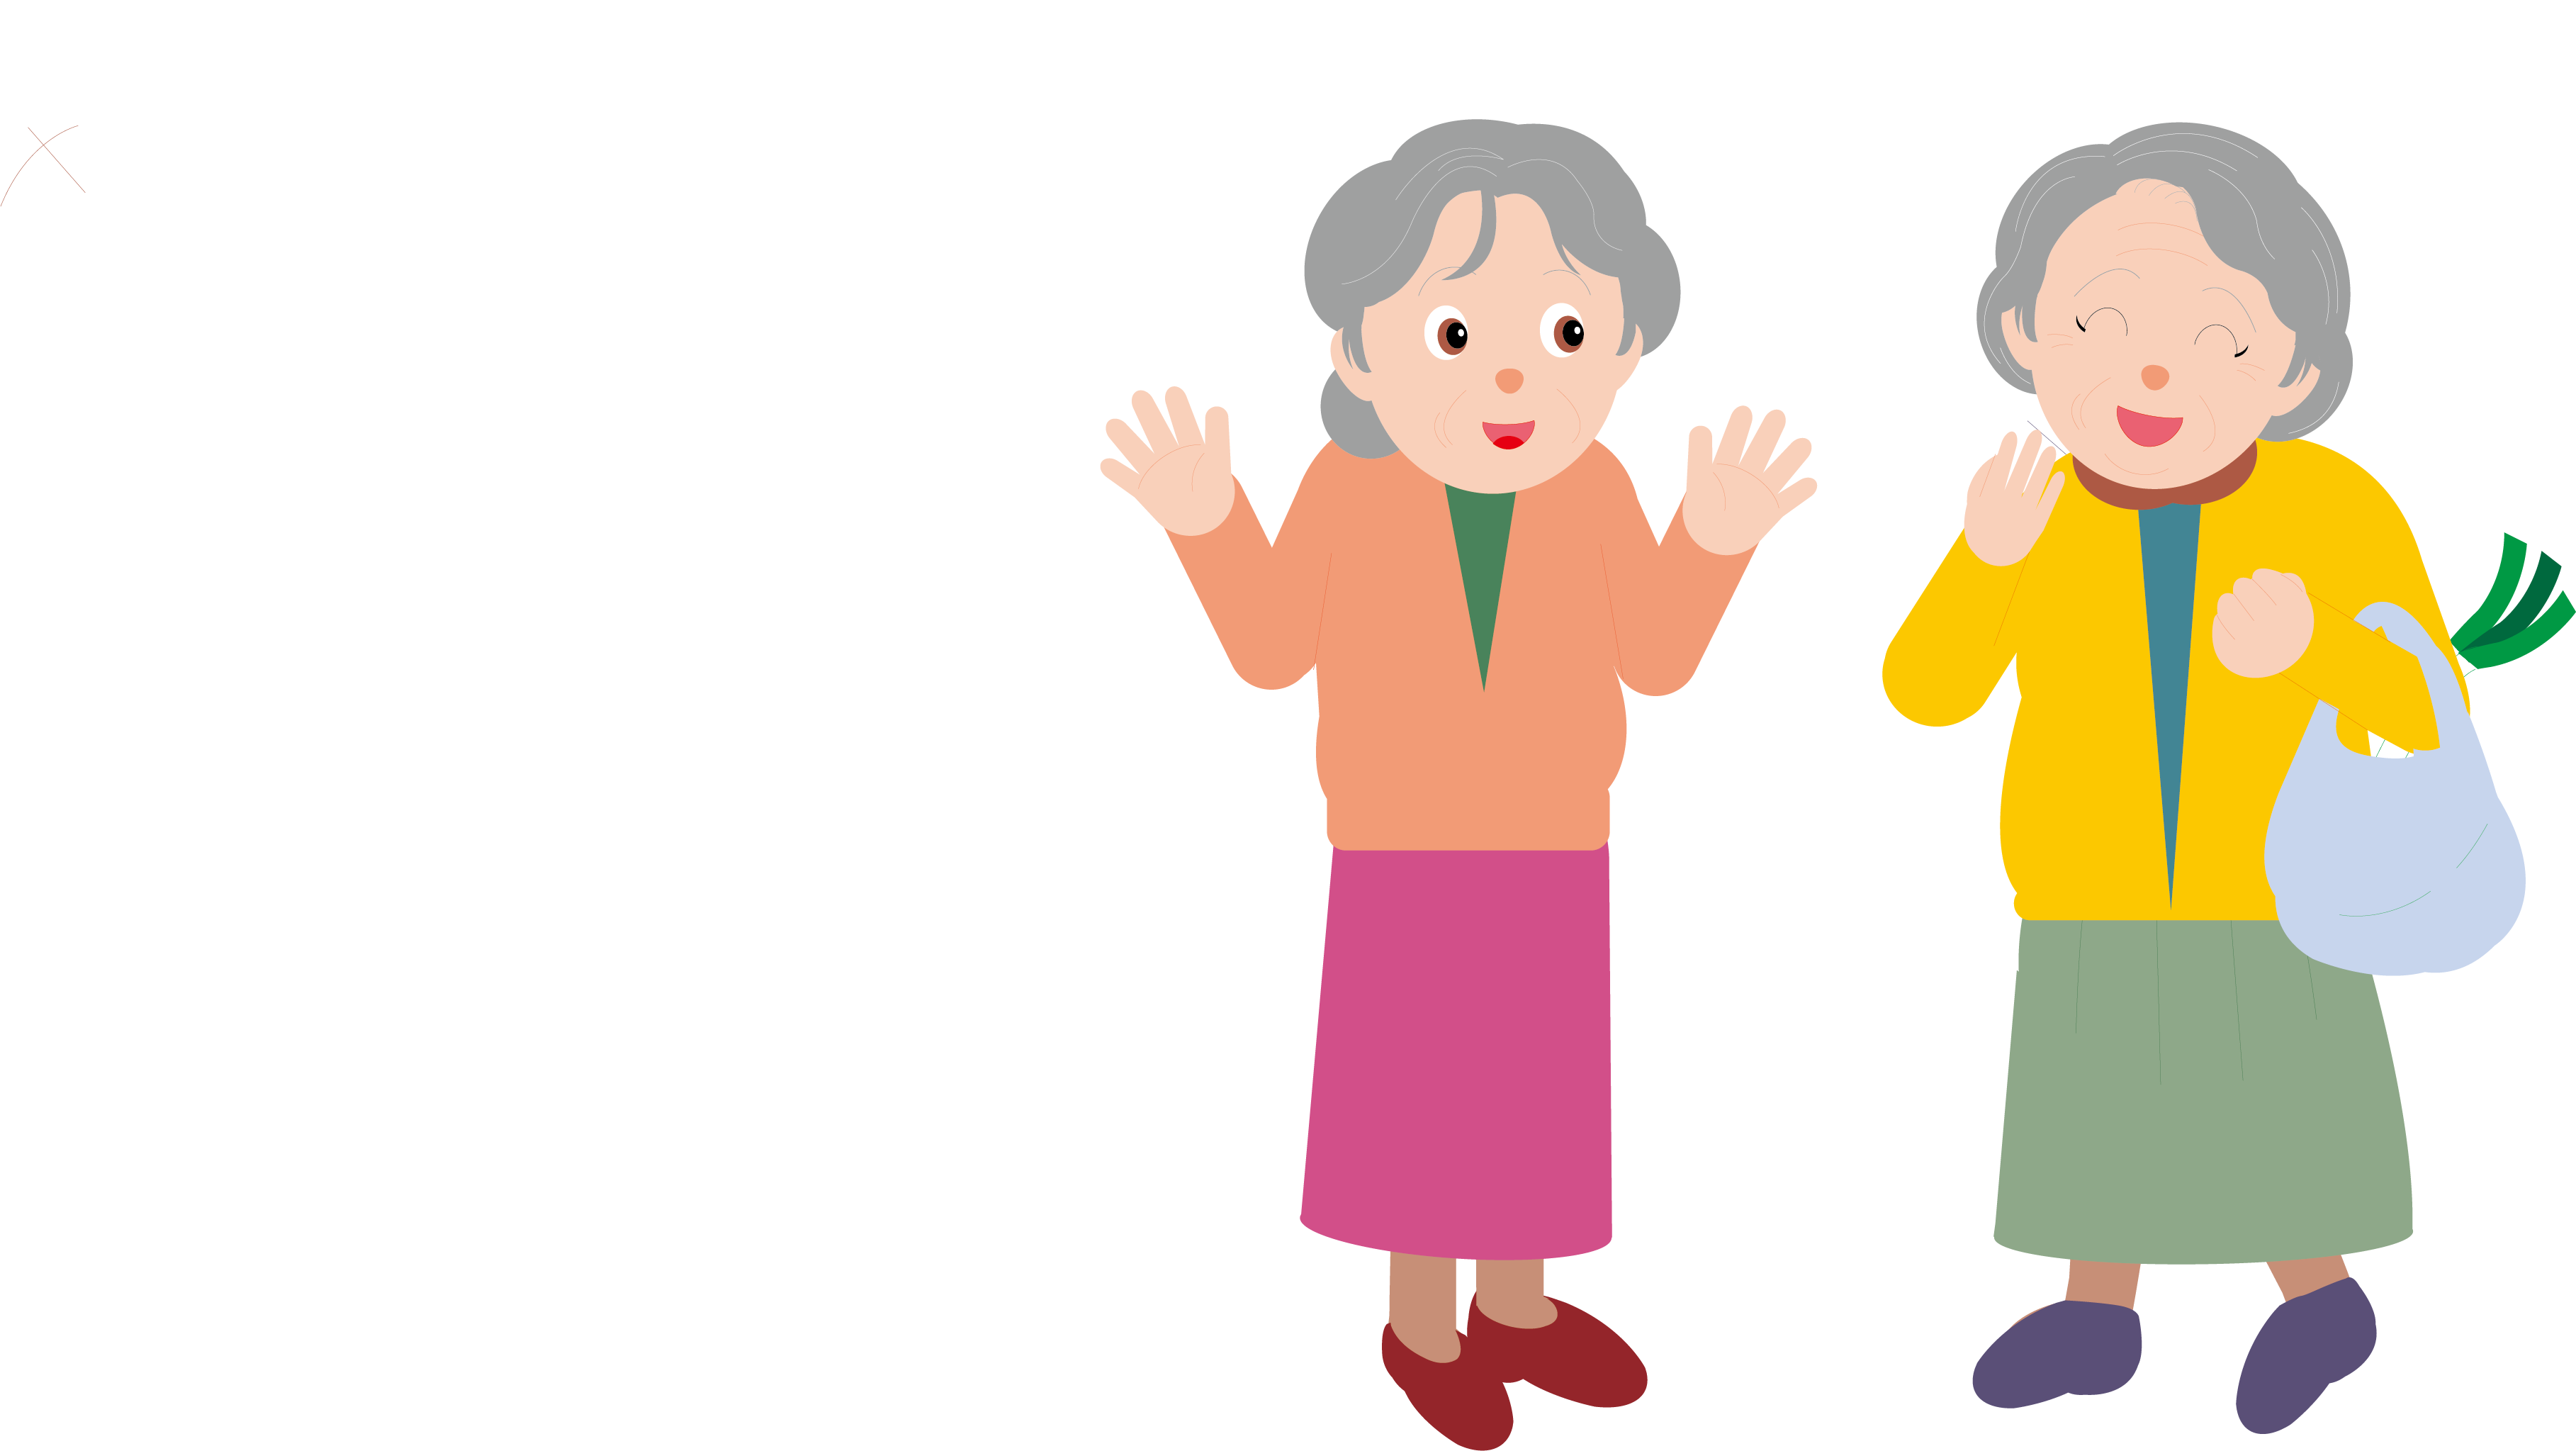 Ottawa cartoon age women. Humans clipart old boy